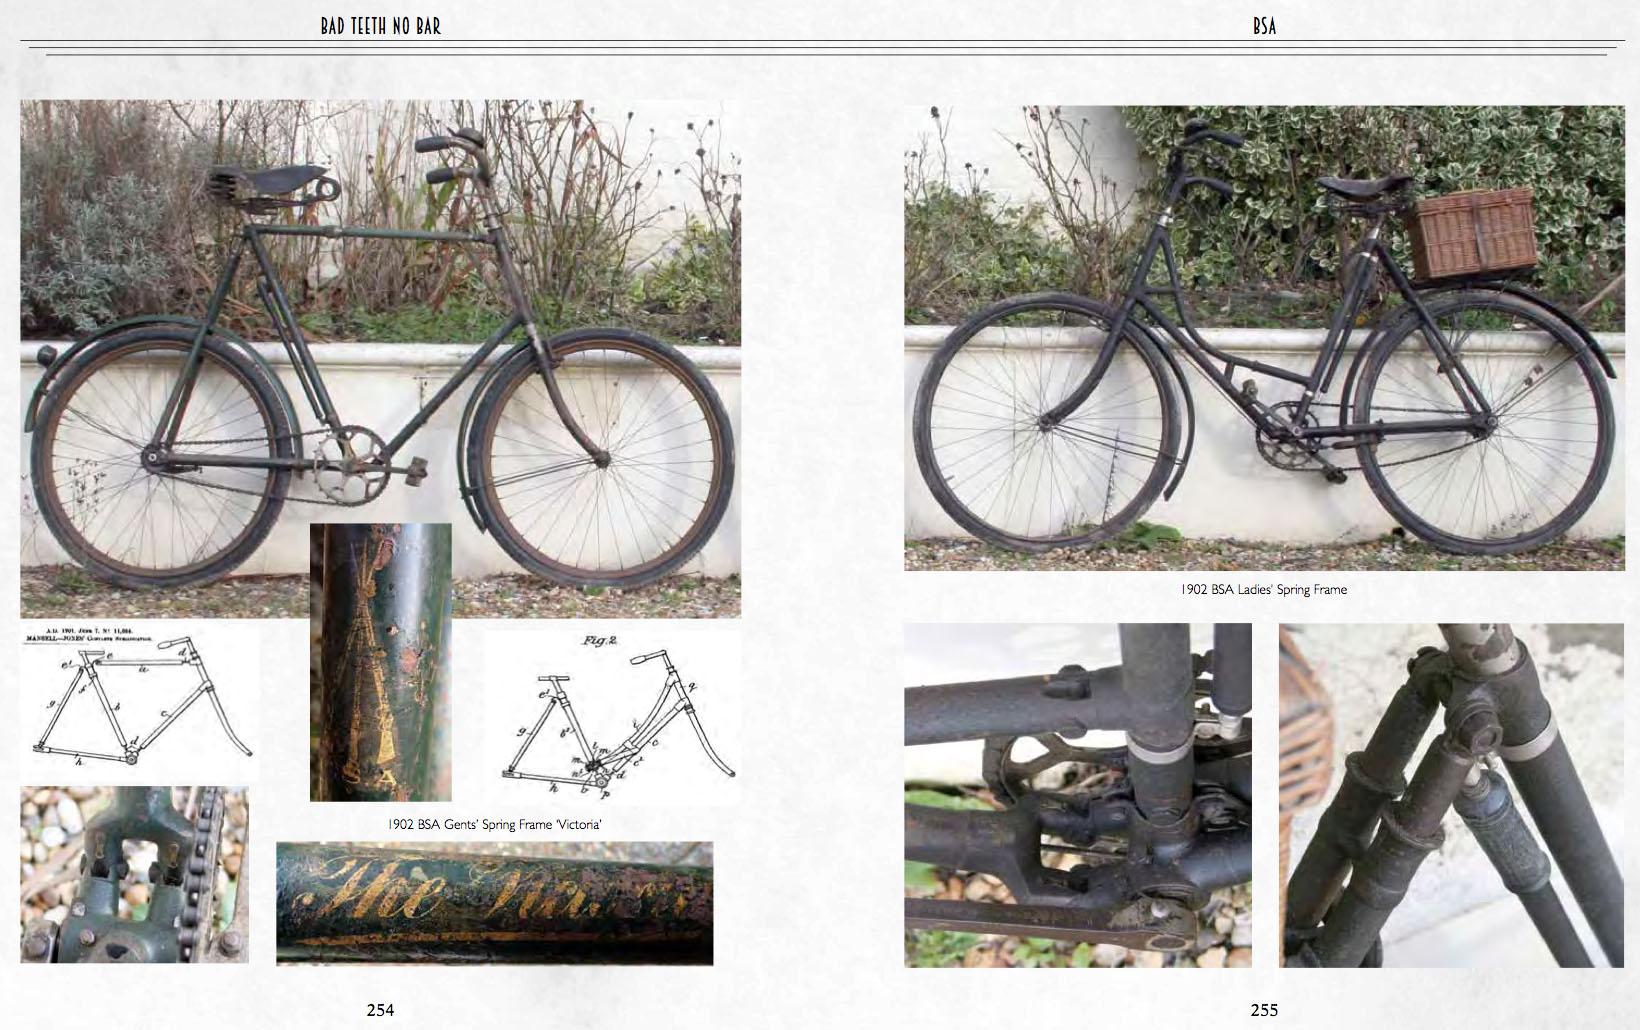 BAD TEETH NO BAR WW1 MILITARY BICYCLE BOOK - BSA SPRINGFRAME